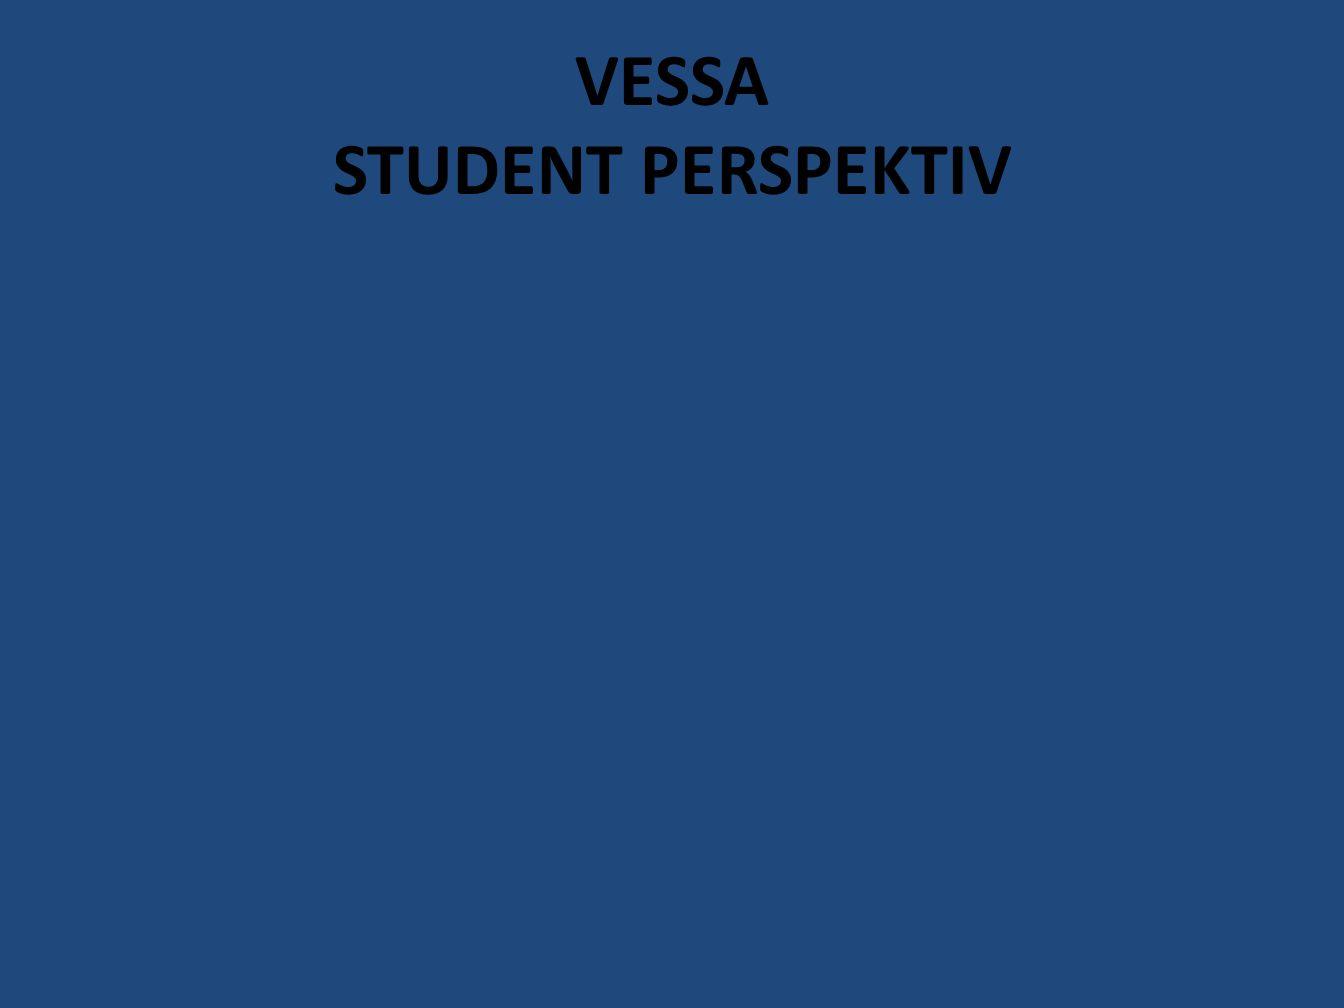 VESSA STUDENT PERSPEKTIV